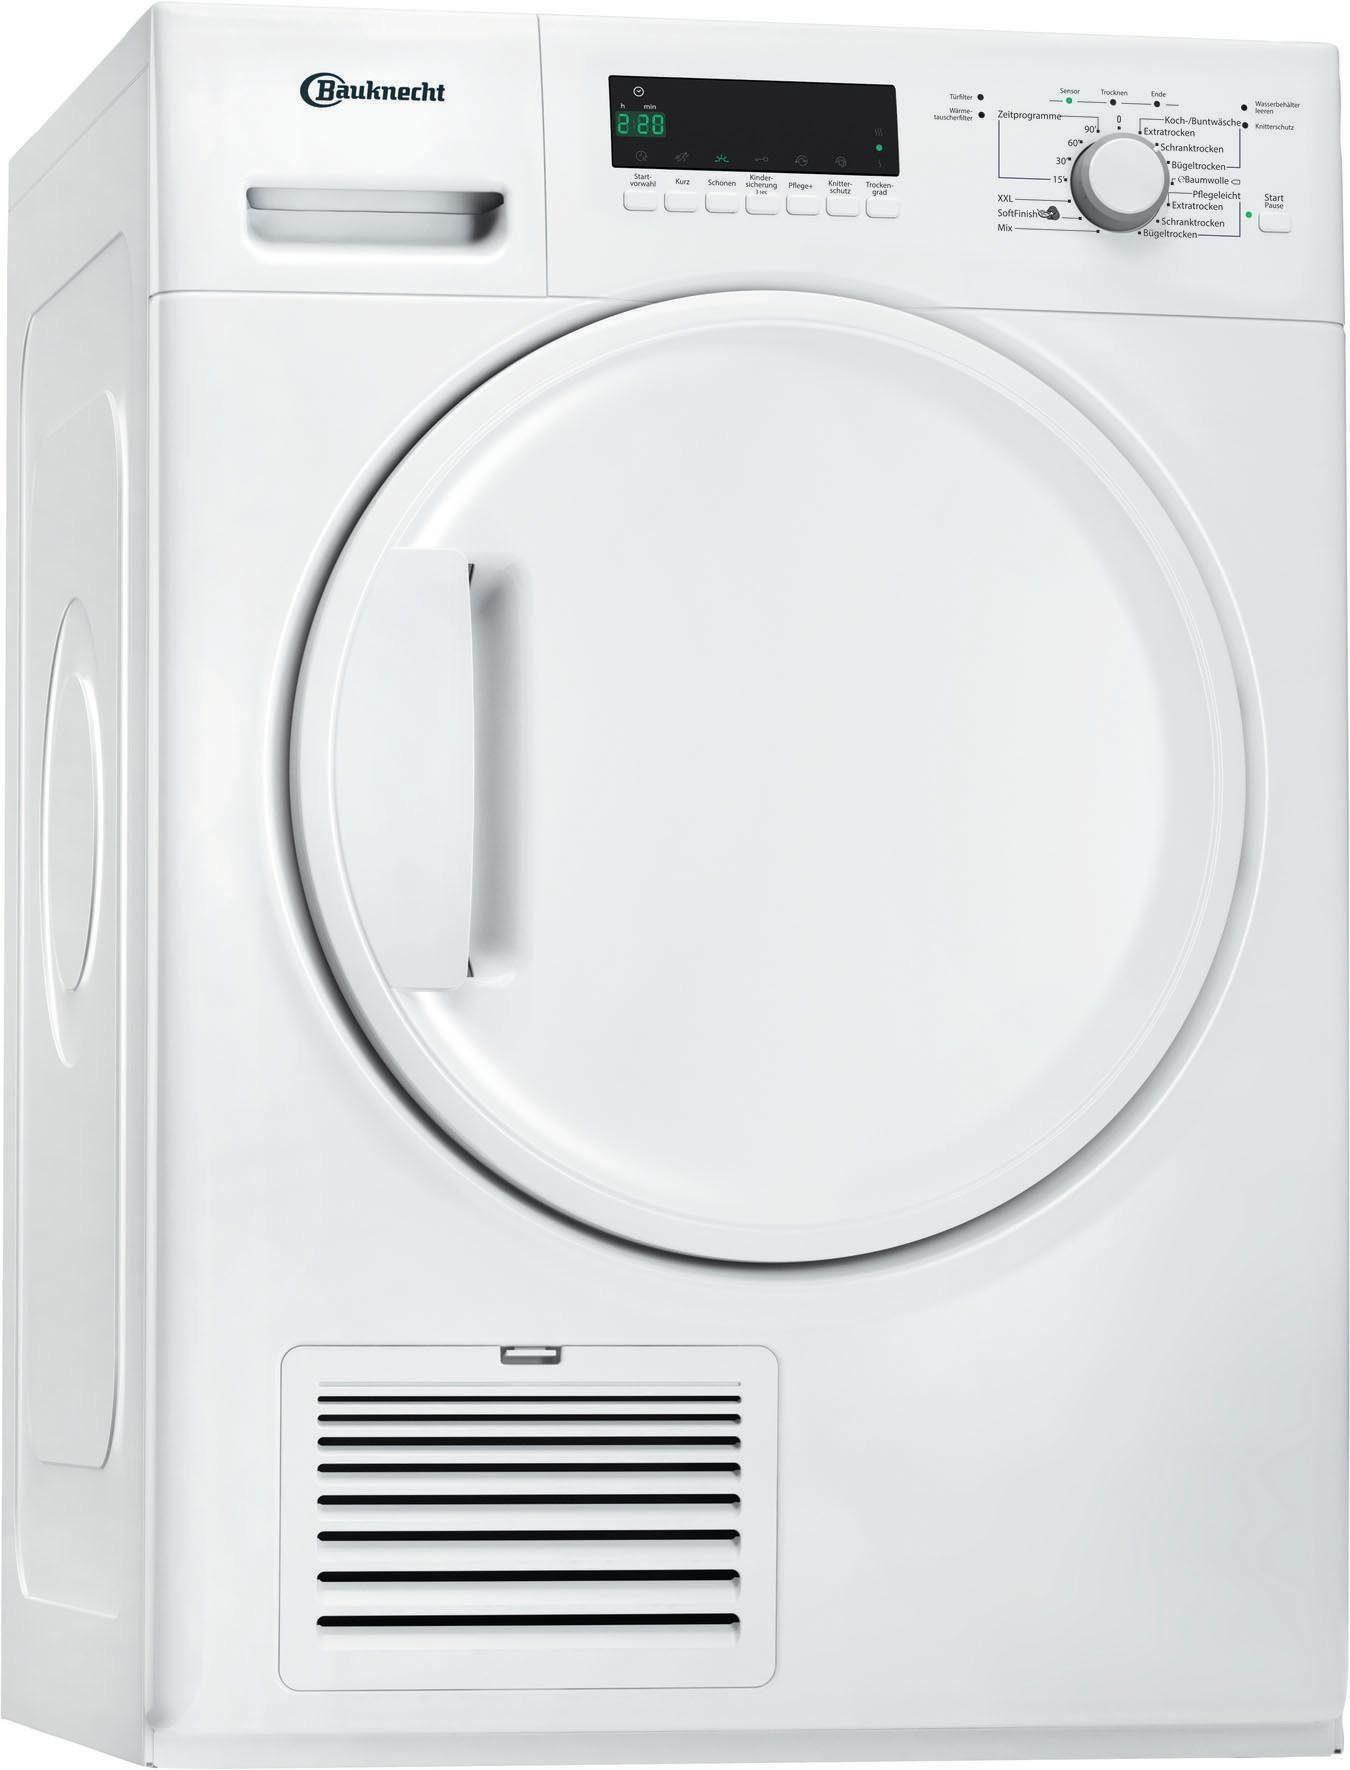 BAUKNECHT Kondenstrockner TK Plus 8BBW, 8 kg